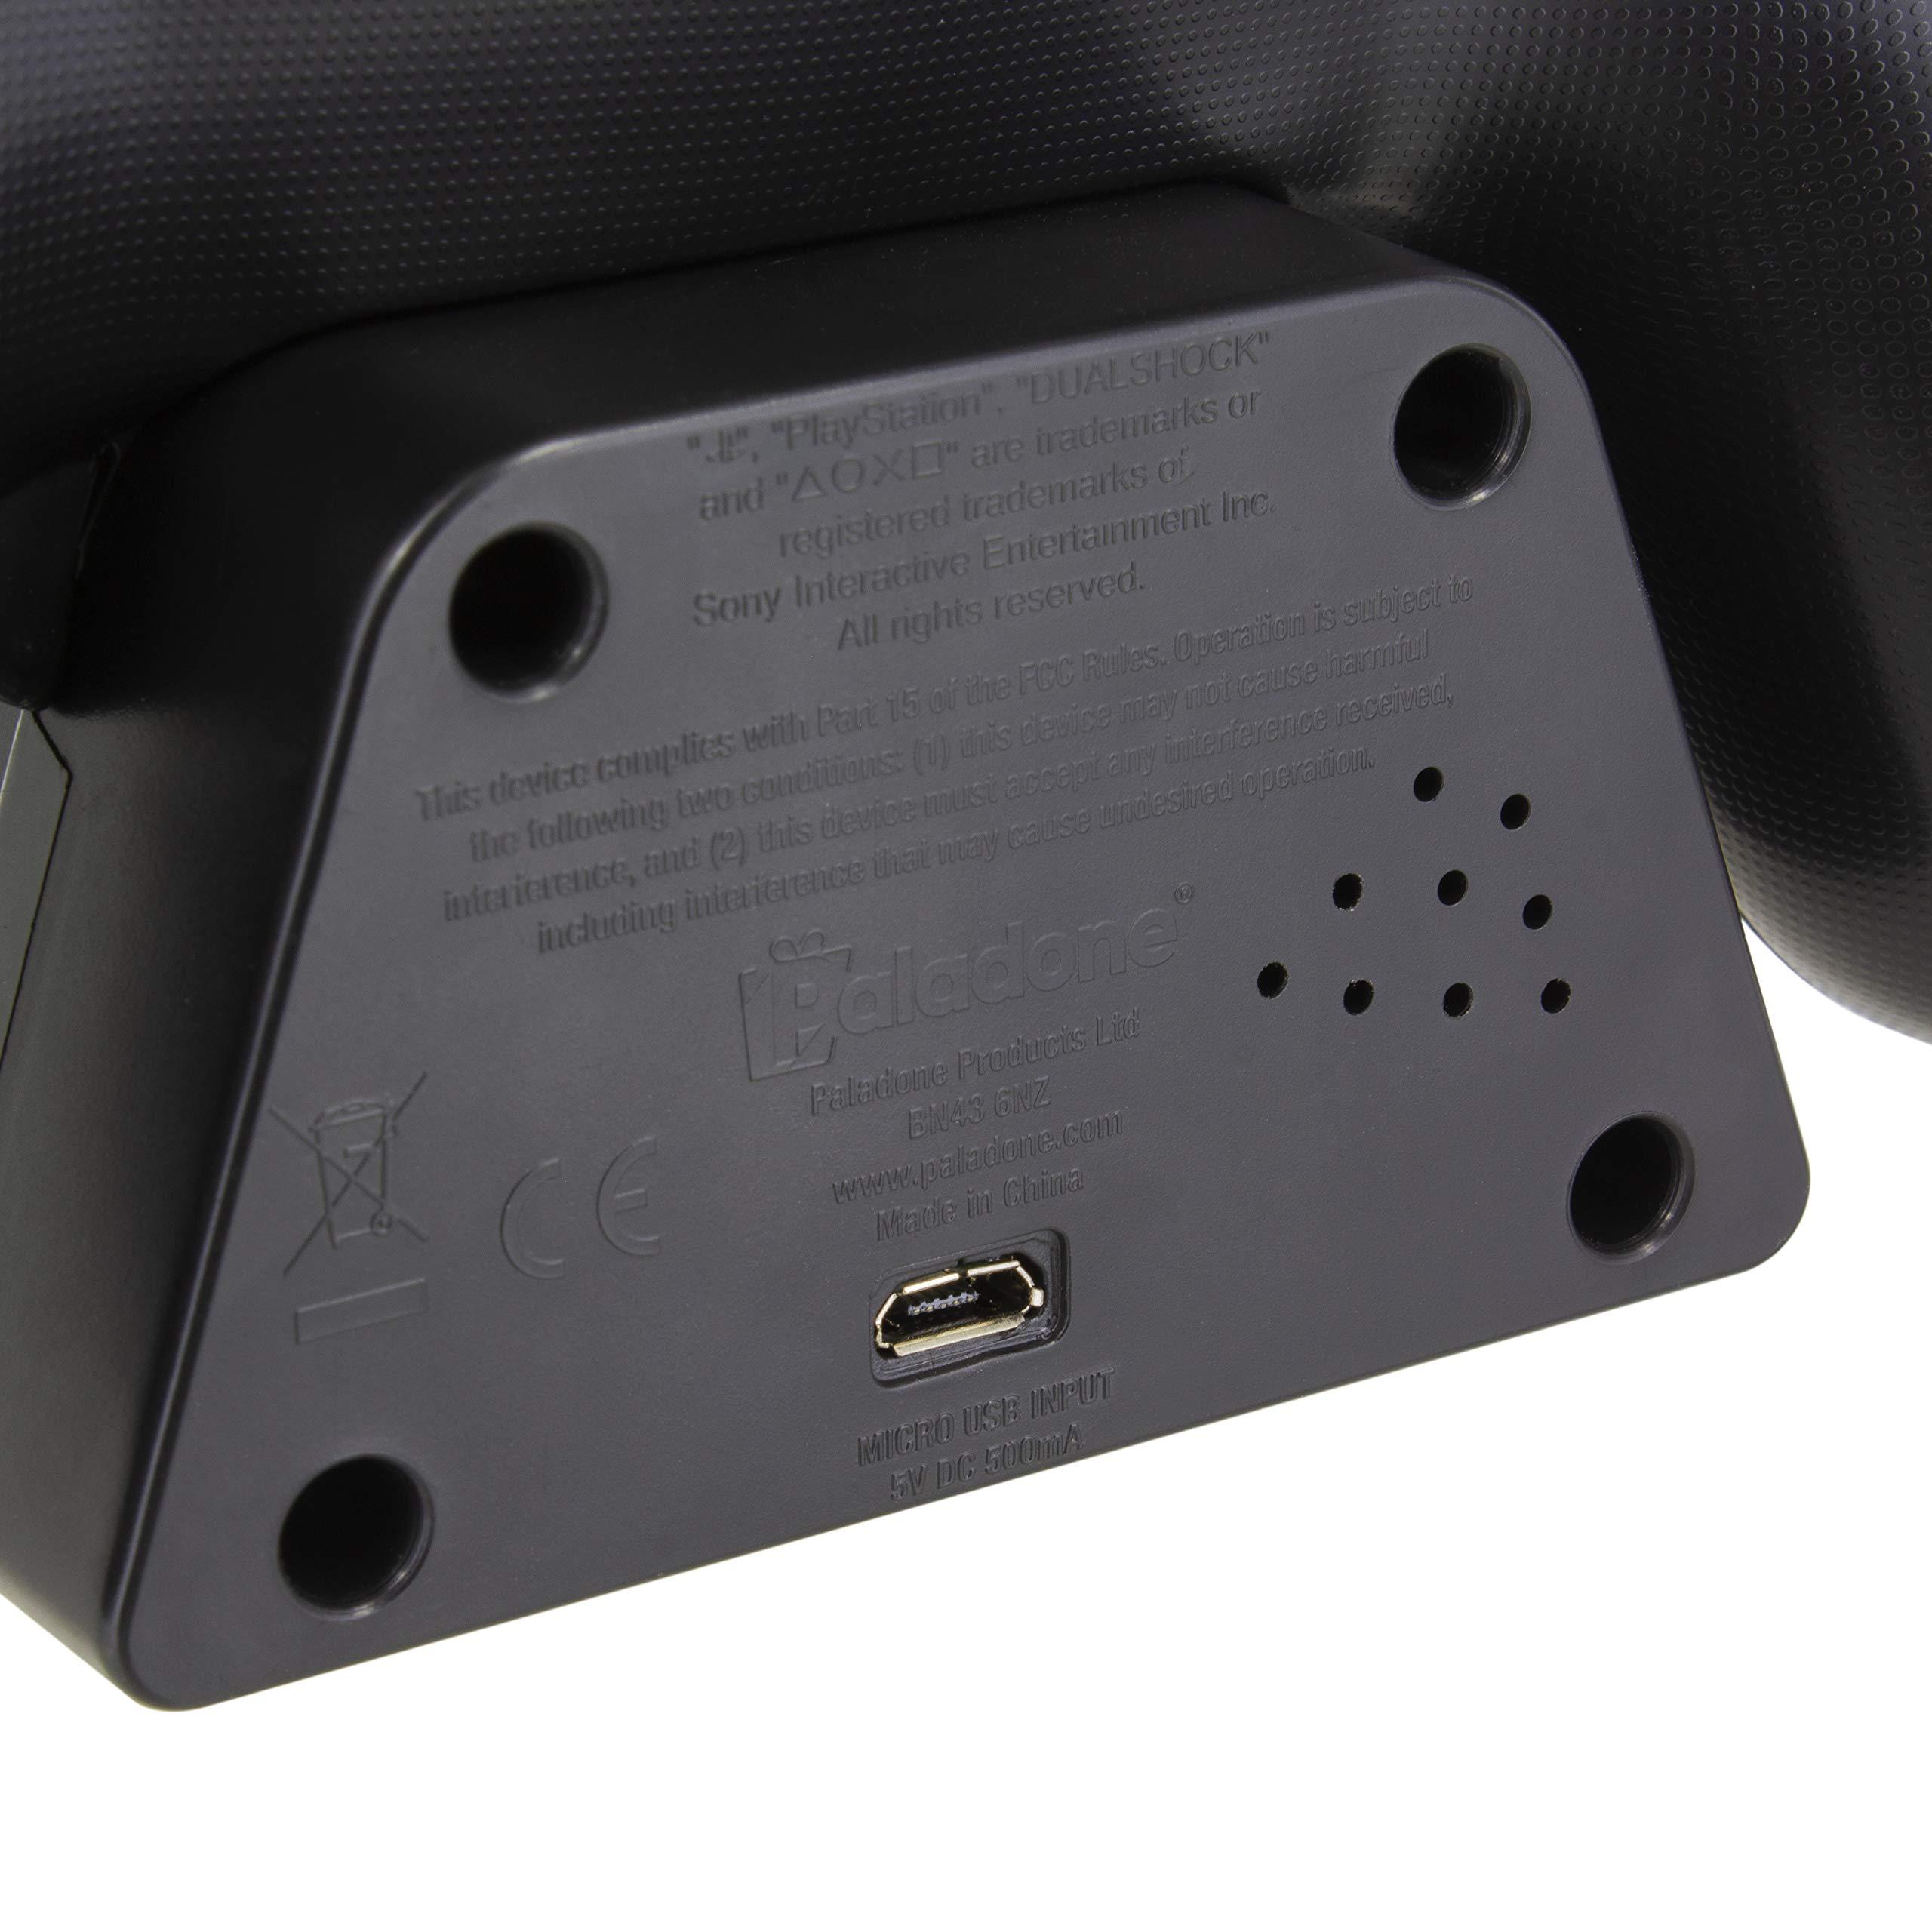 Playstation Digital Réveil LCD | PS4 Dualshock Controller